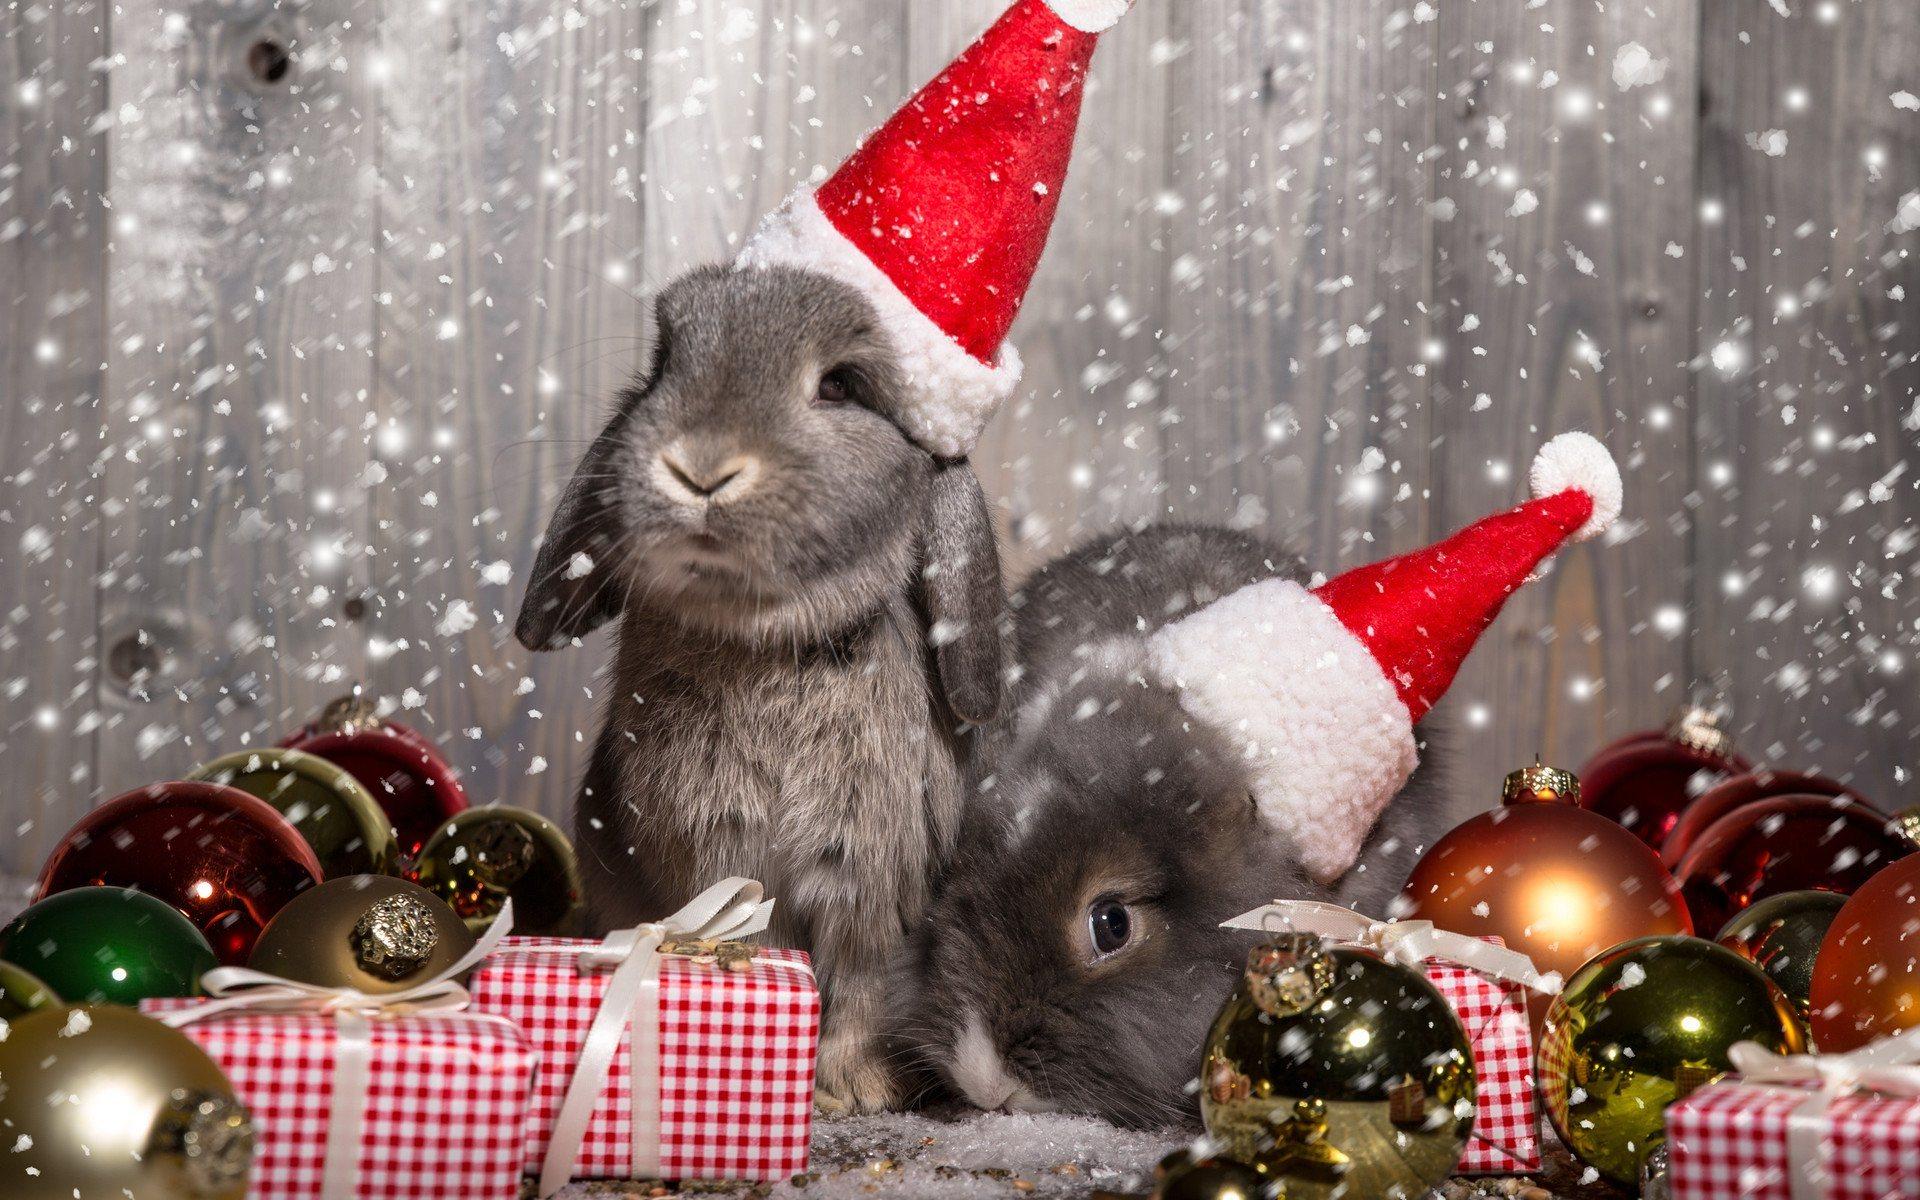 хотя код кролика картинки лаг для